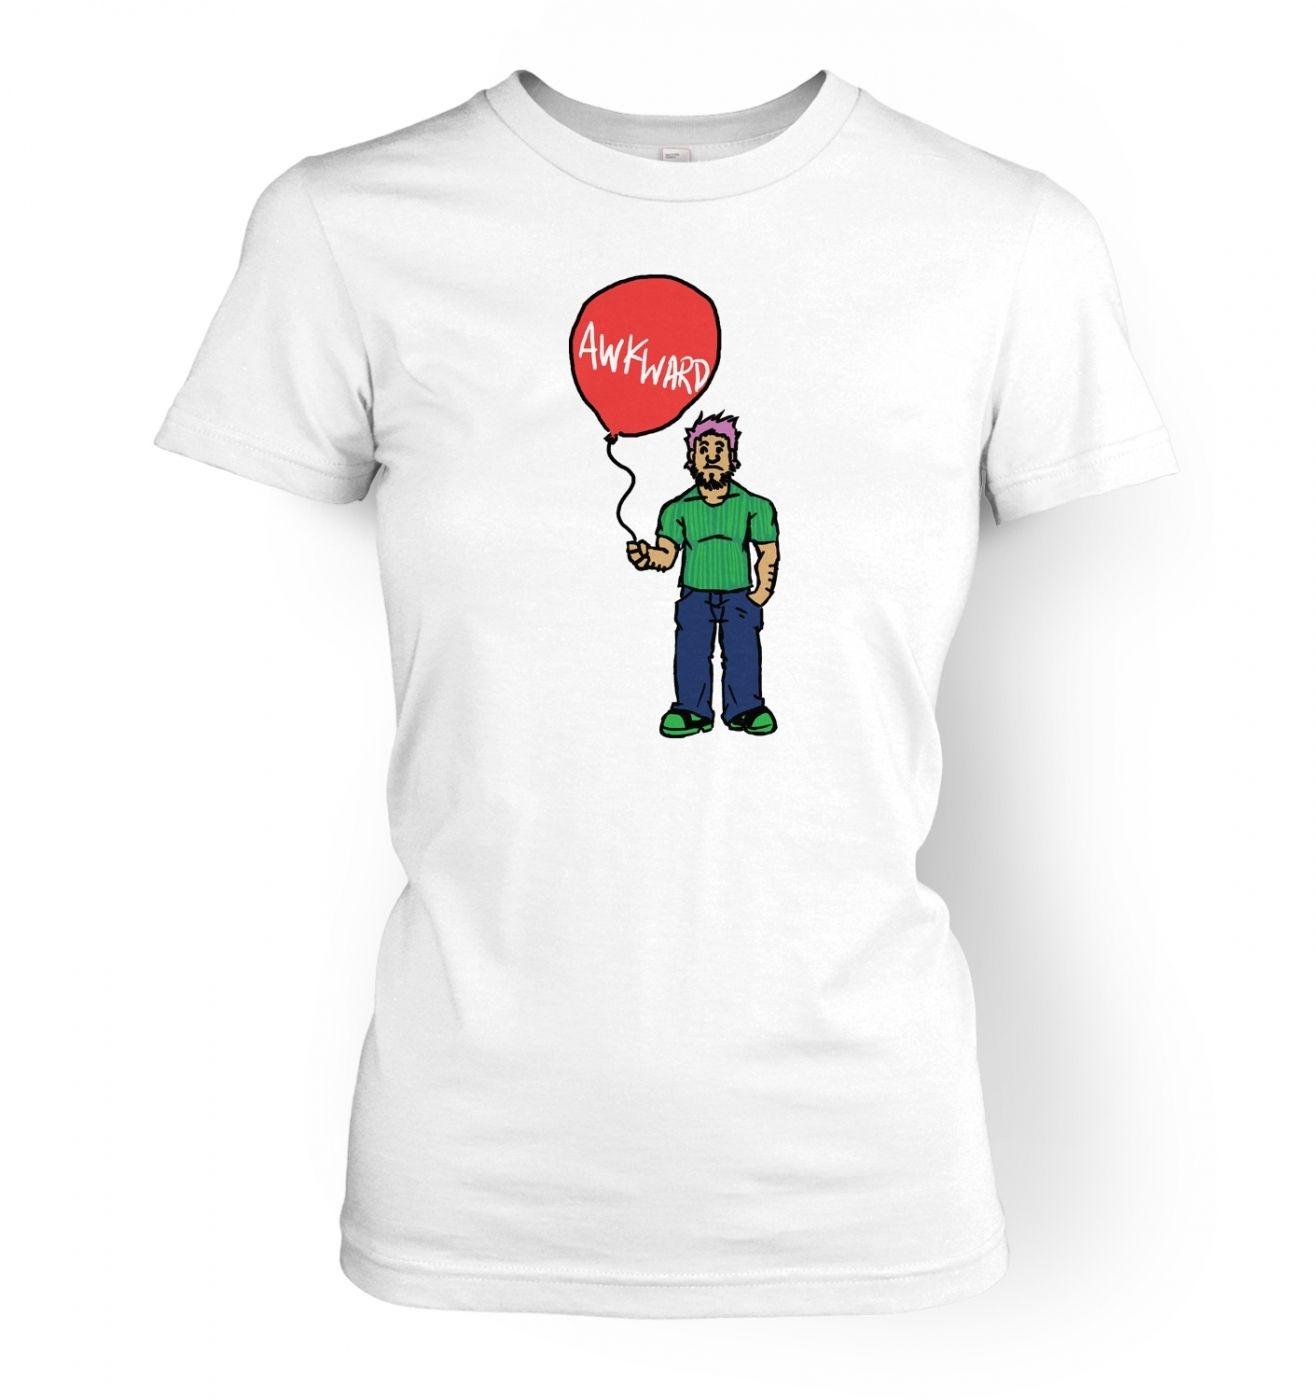 Awkward Balloon Guy women's fitted t-shirt